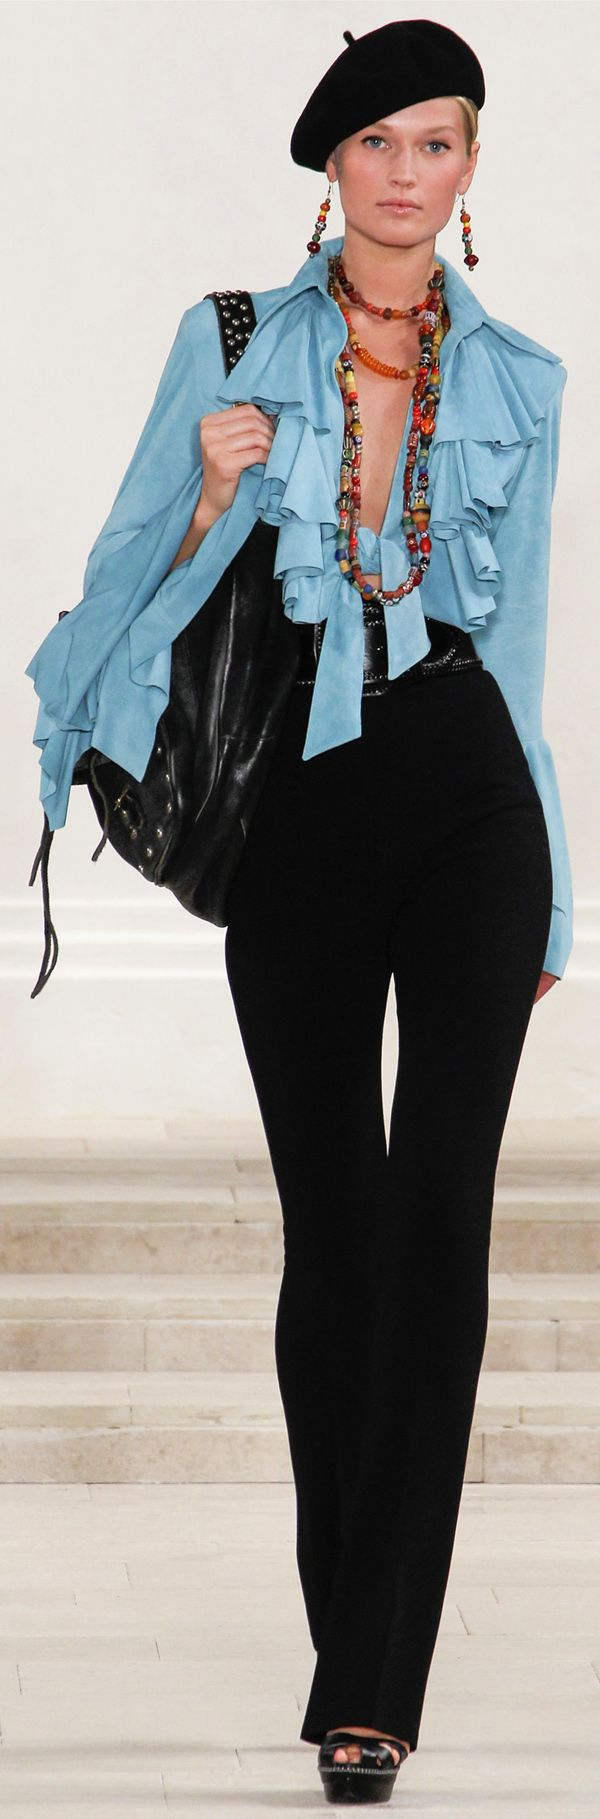 1123 Best Clothes Images On Pinterest Blouse Blouses And Dress Skirt Minimal Floral Emb Crop Trouser Jet Black Hitam L Ralph Lauren Spring 2013 Ready To Wear Fashion Show Toni Garrn